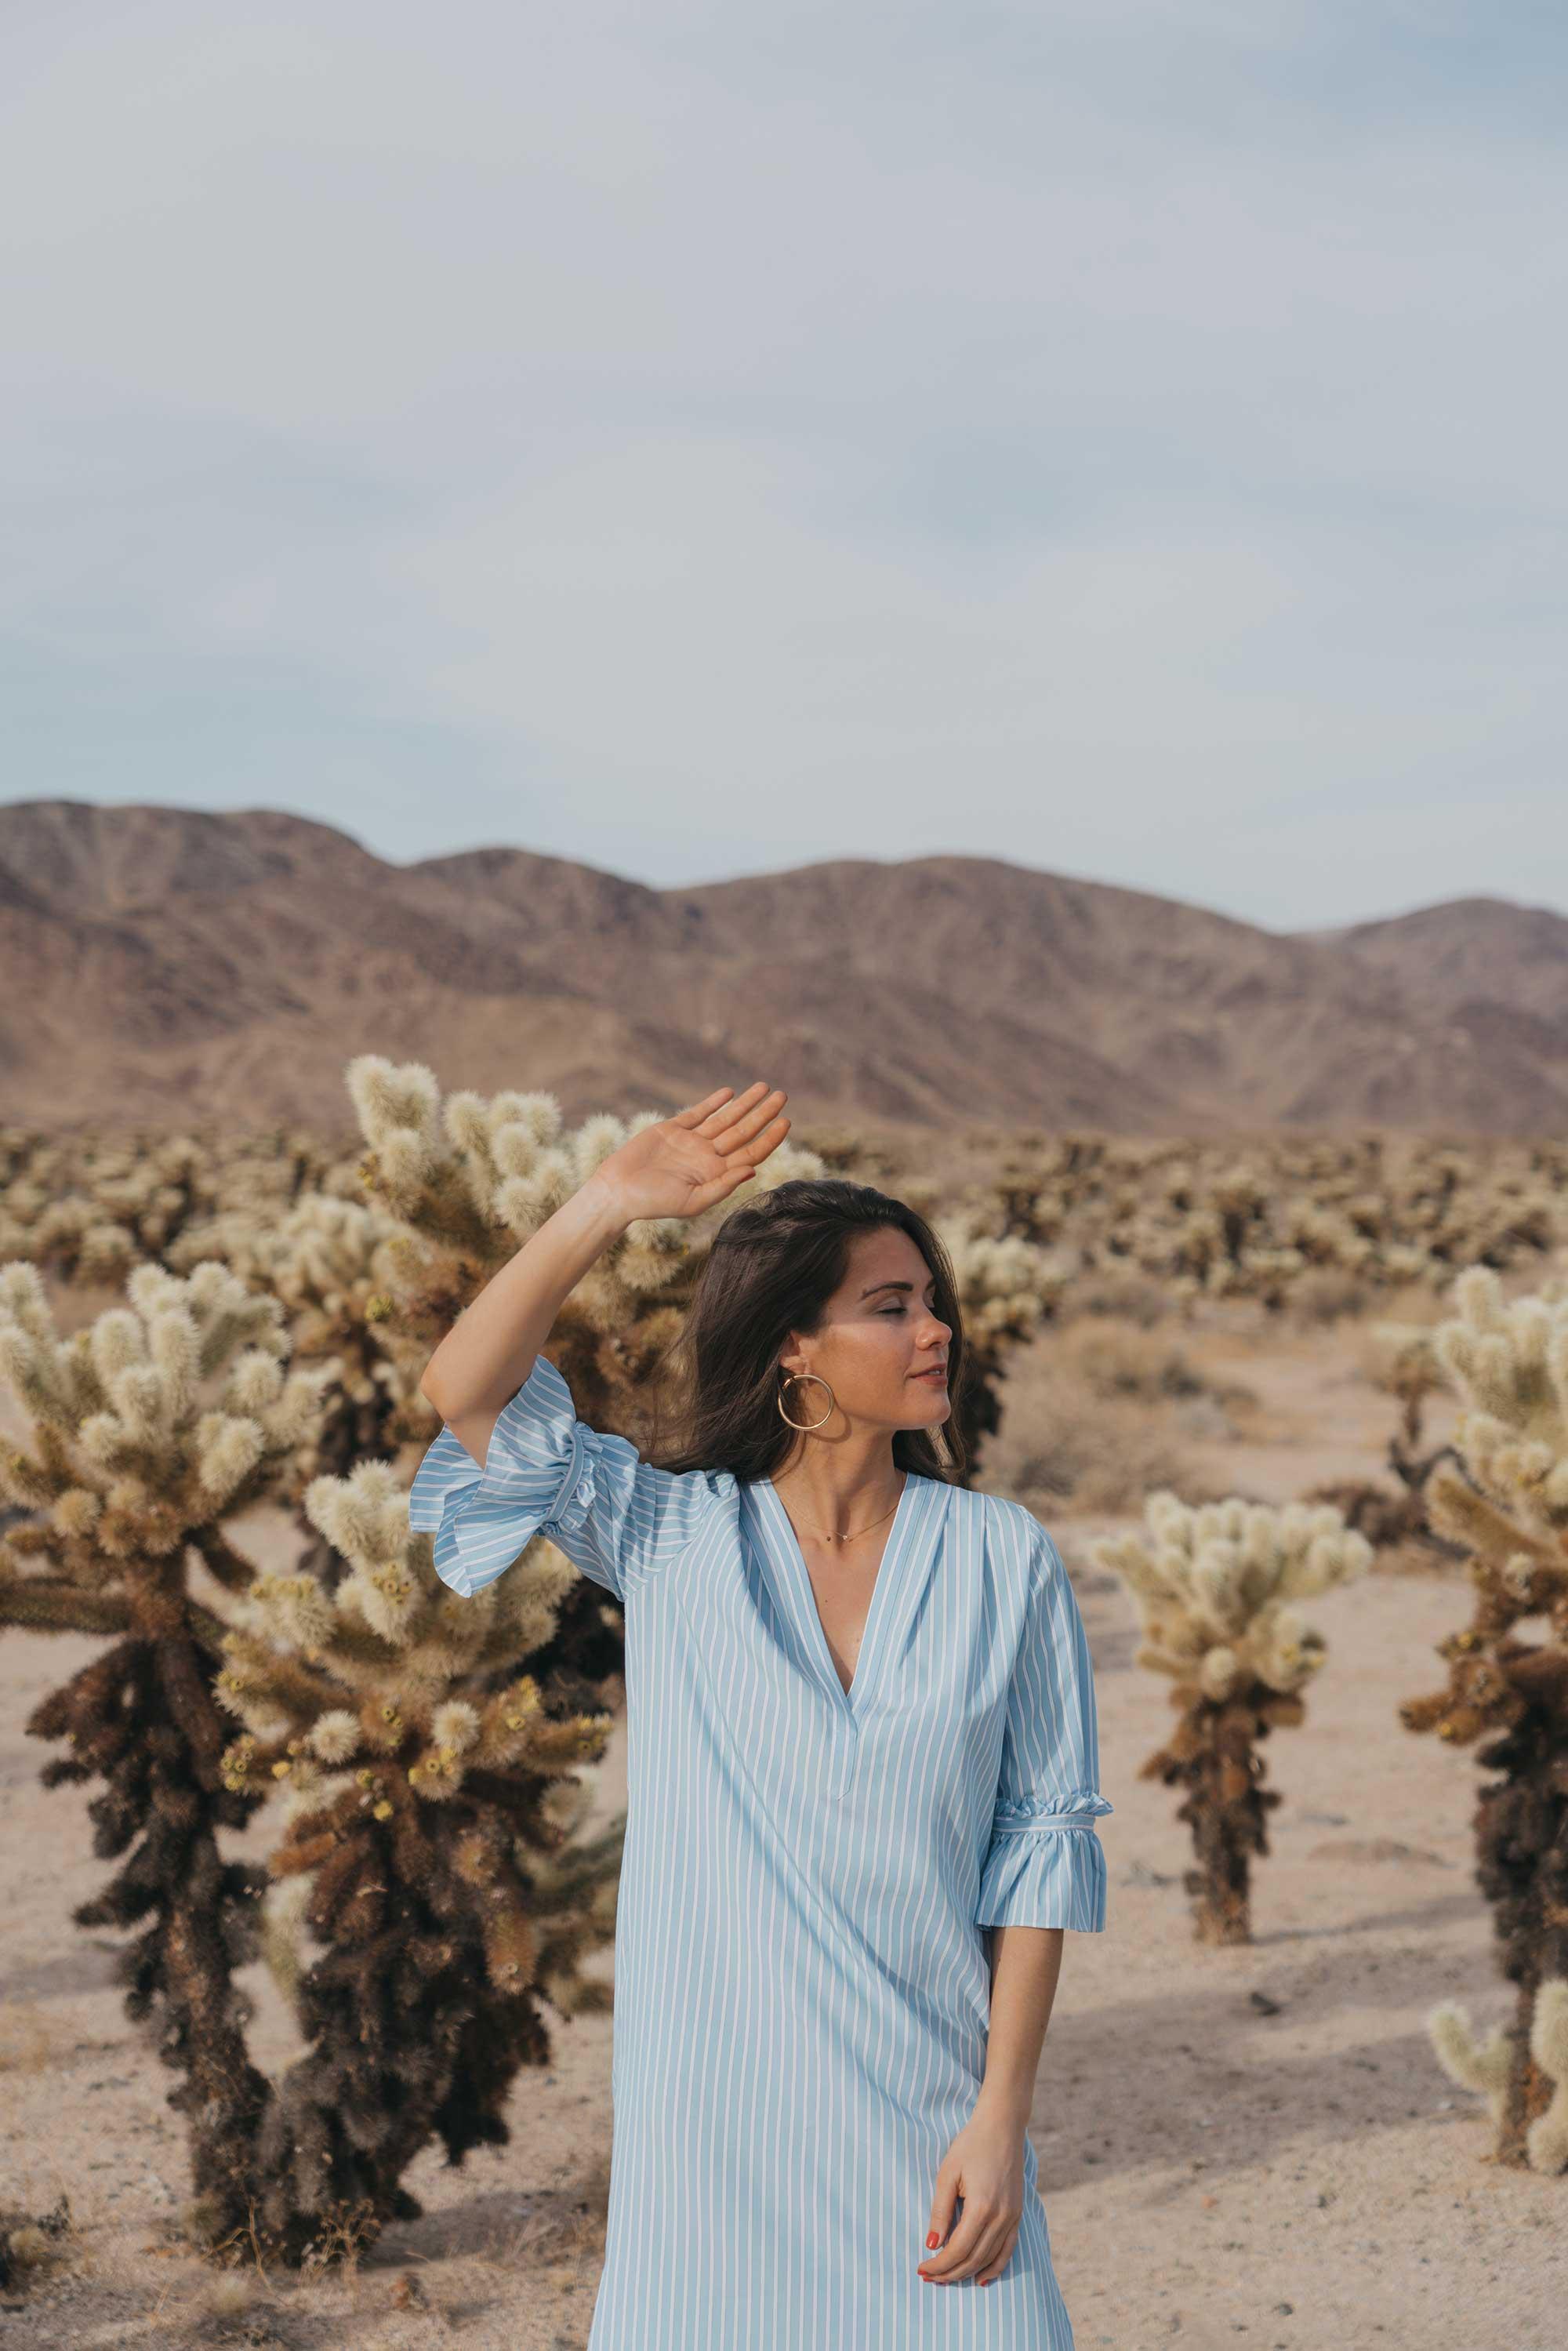 Frill Sleeve Maxi Shirt Dress Festival Outfit Coachella Joshua Tree Cholla Cactus Garden13.jpg